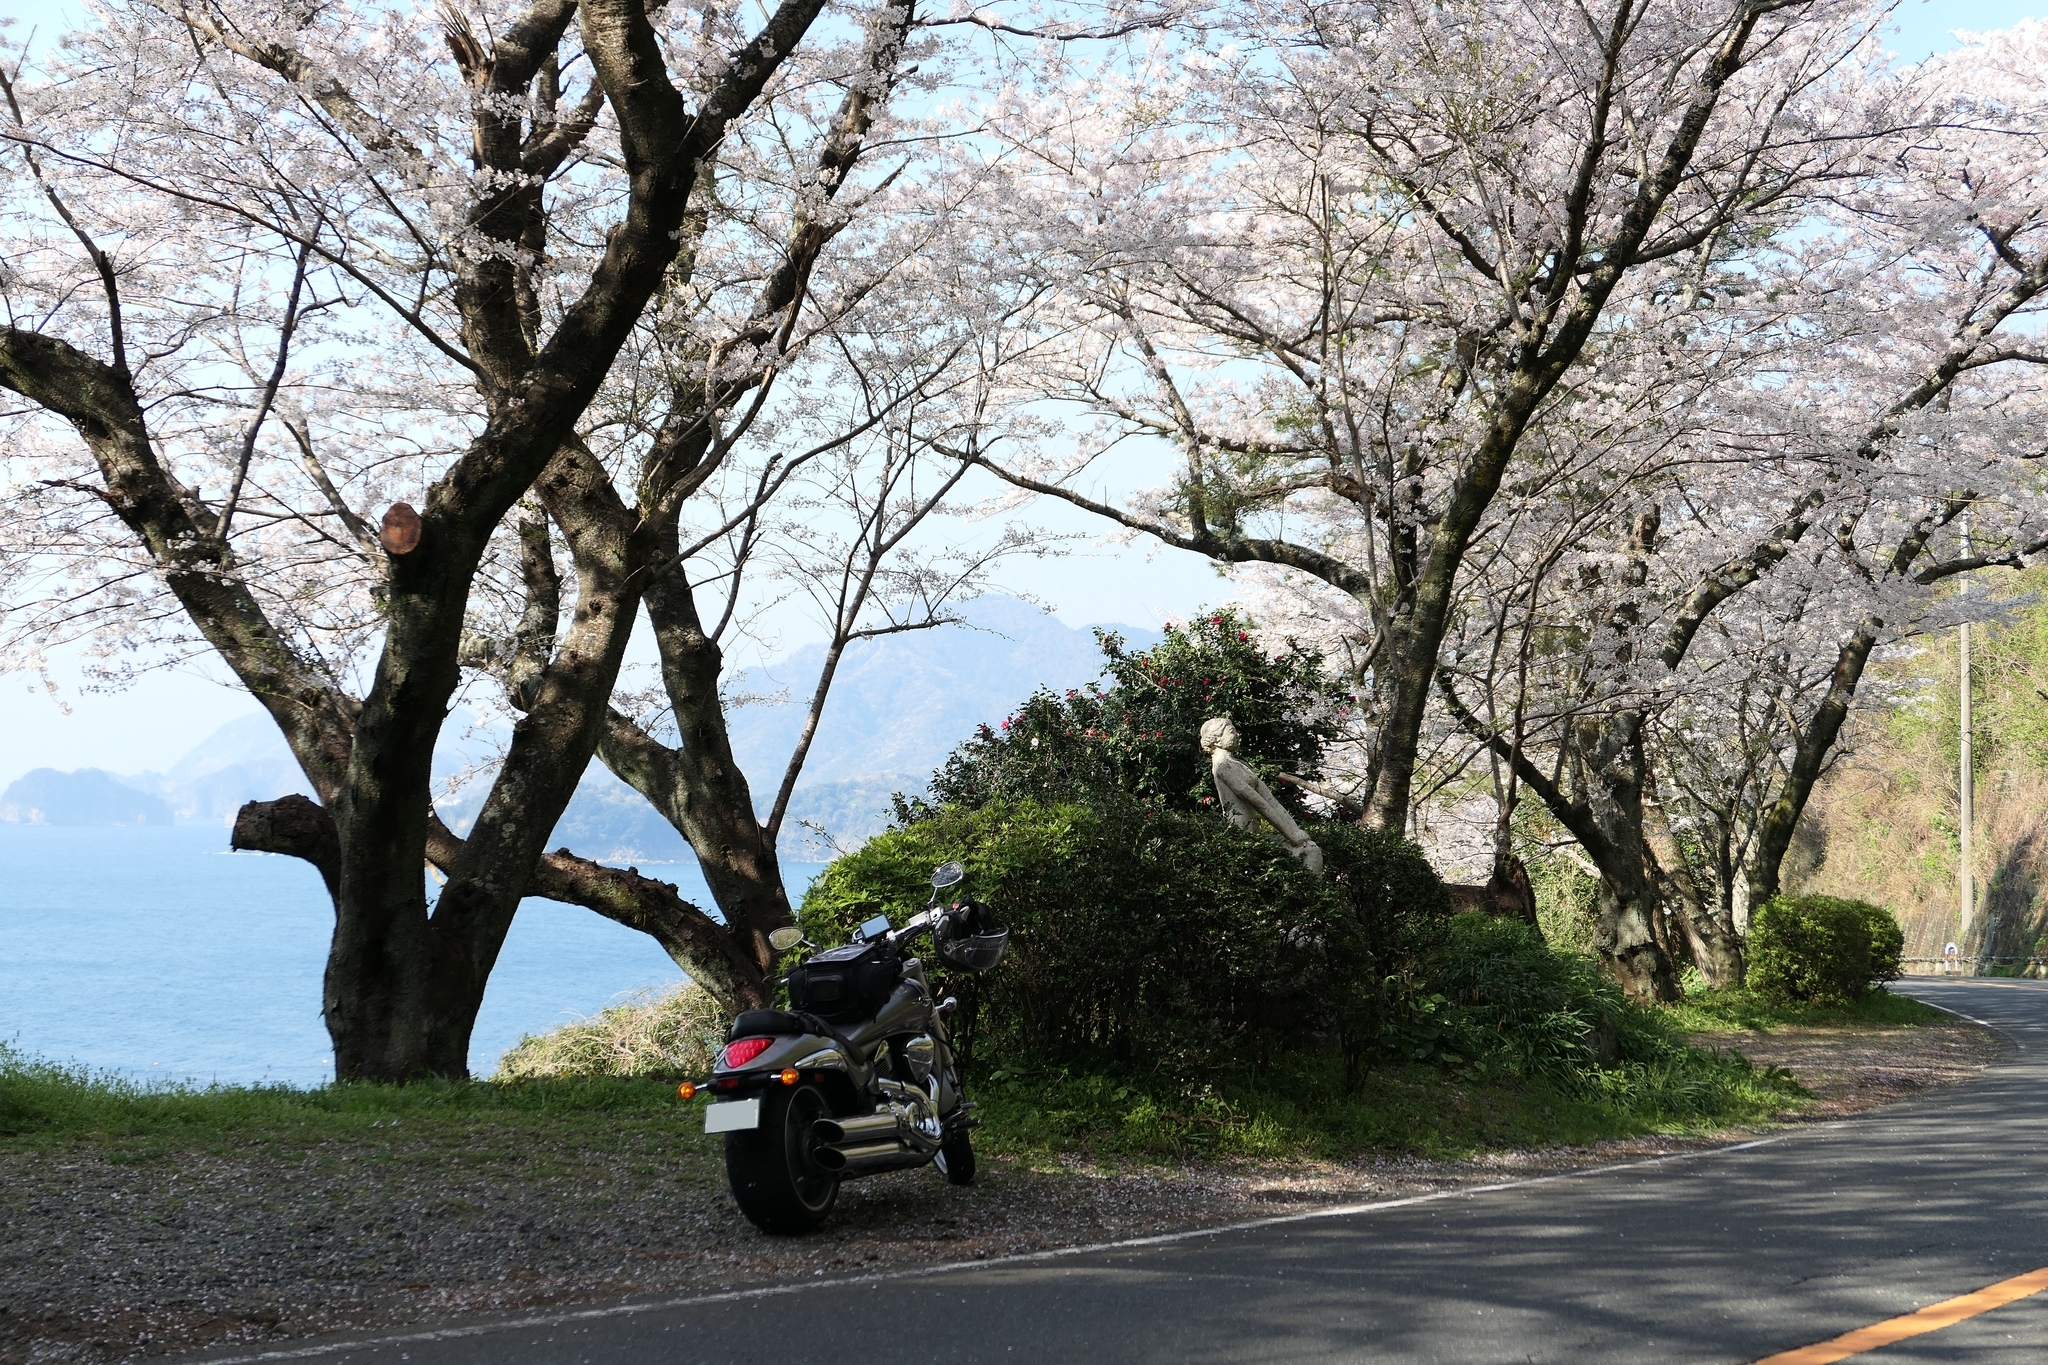 f:id:ToshUeno:20180328151439j:plain